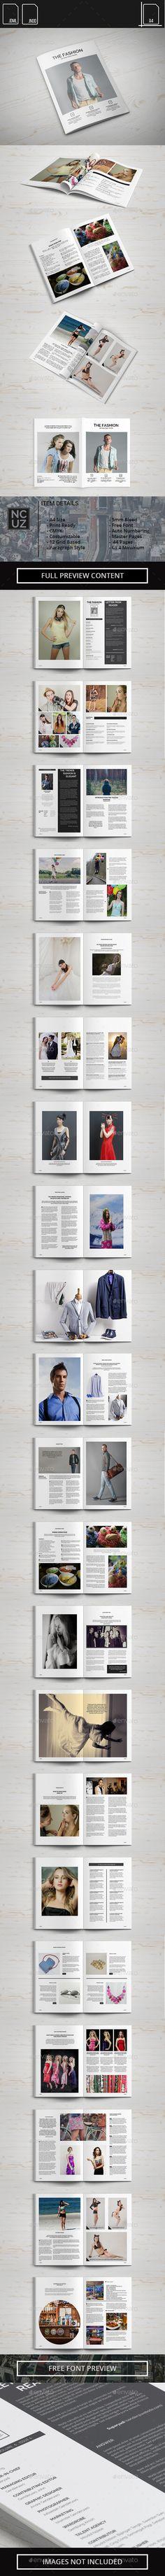 Simple Fashion Magazine Template #design Download: http://graphicriver.net/item/simple-fashion-magazine-/11802889?ref=ksioks